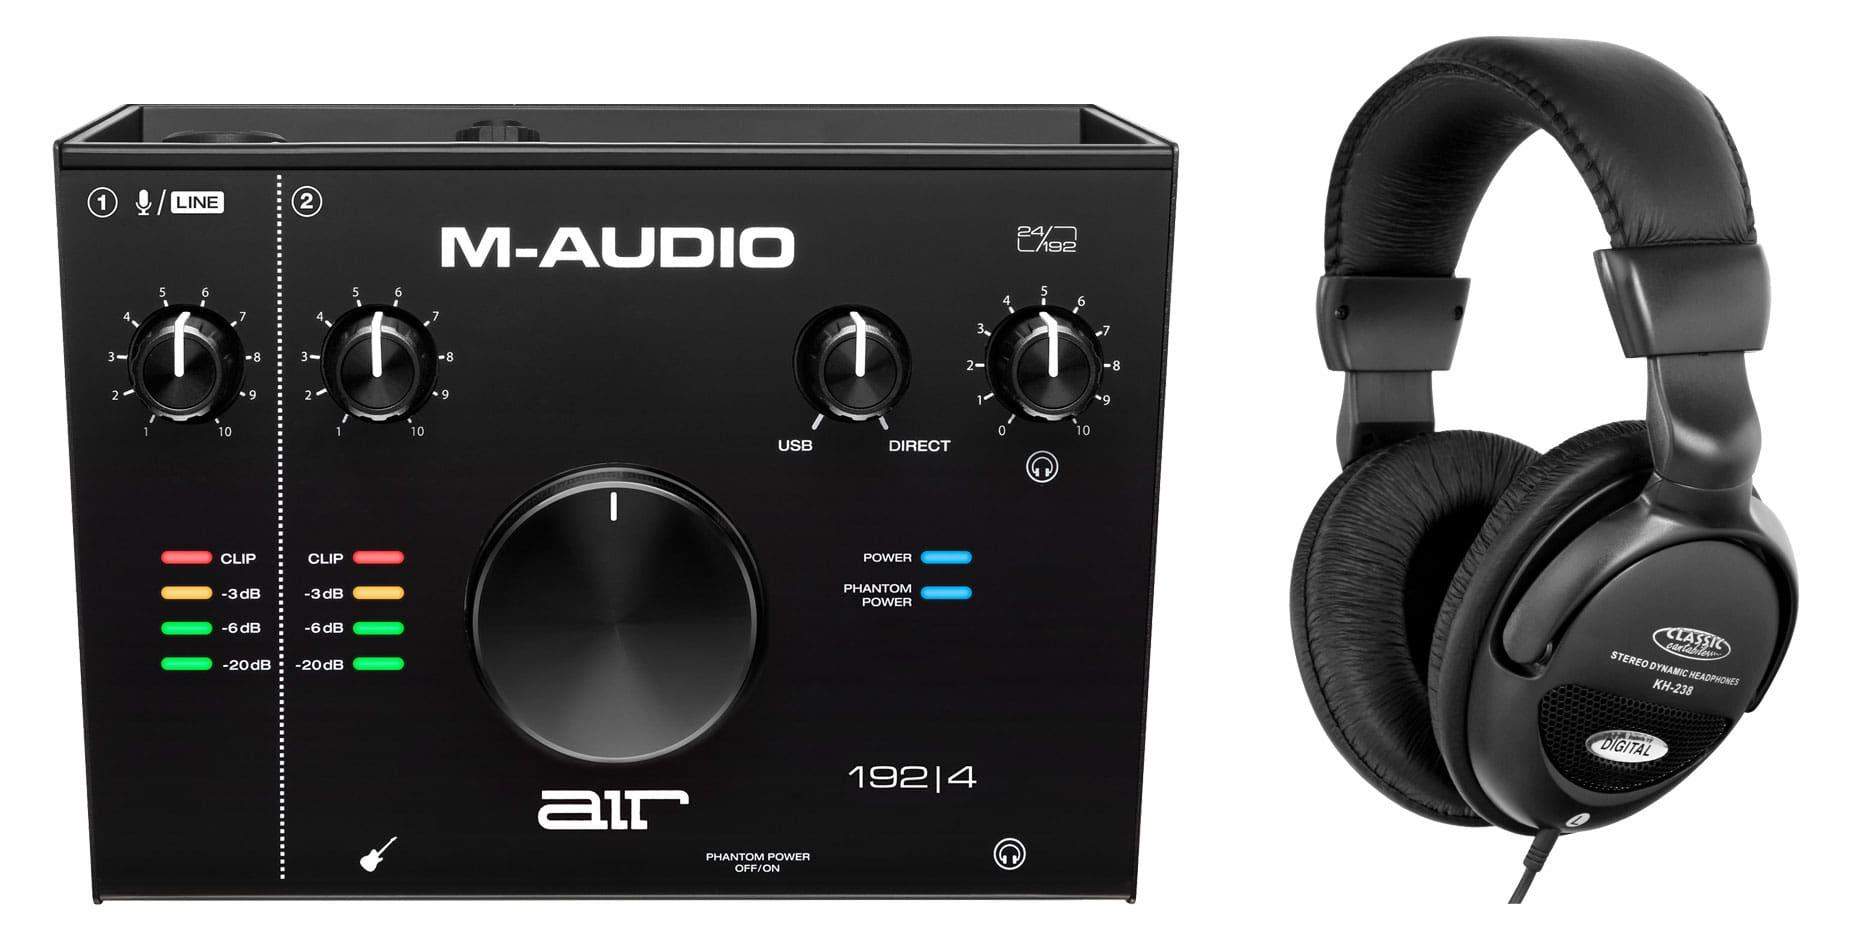 Pchardware - M Audio AIR 192|4 Interface Set - Onlineshop Musikhaus Kirstein